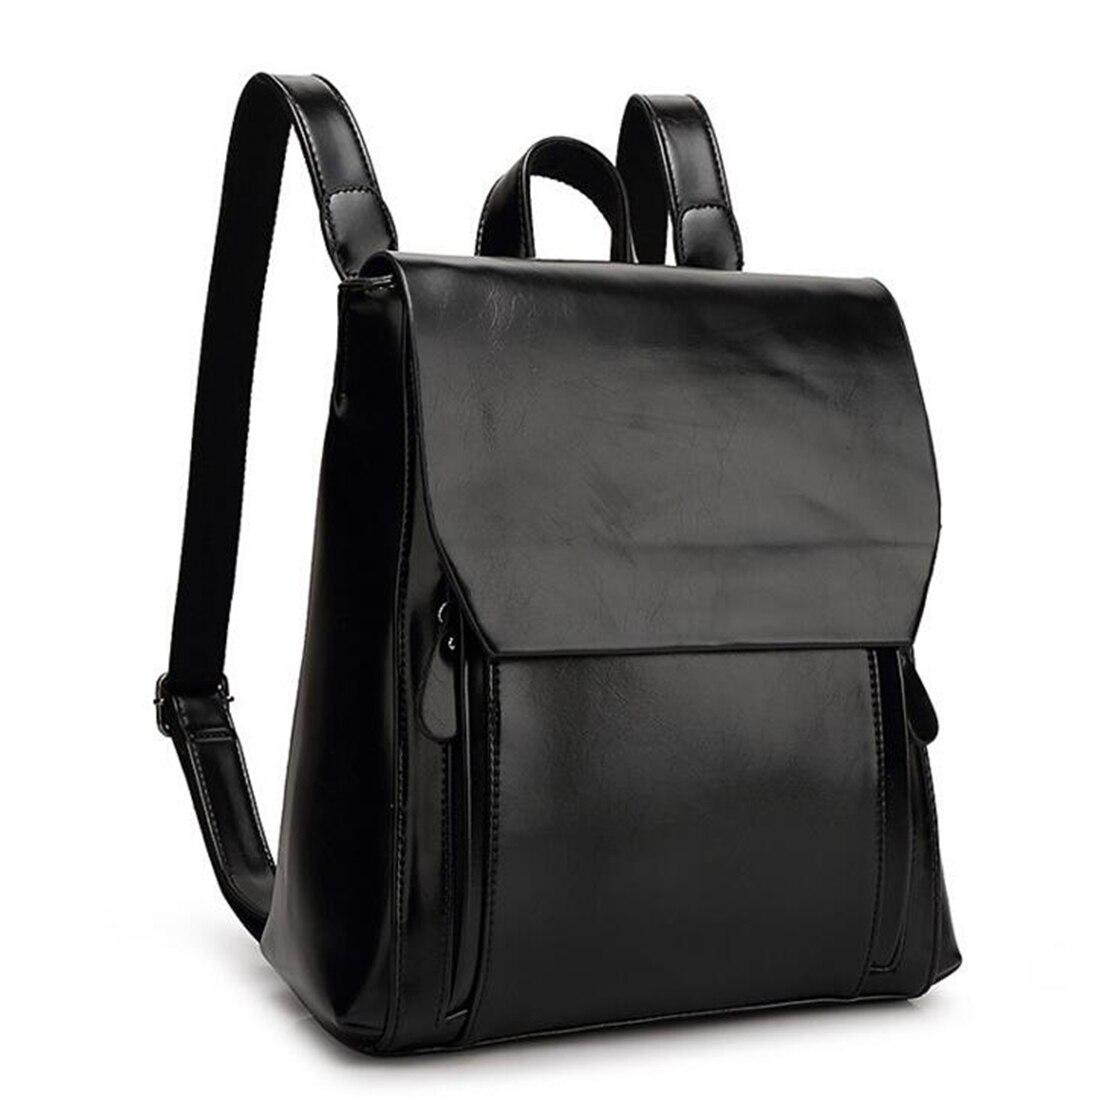 SFG HOUSE Fashion Women PU Leather Backpack Casual Girls Rucksack Bag 2017 Teenagers School Bags Ladies